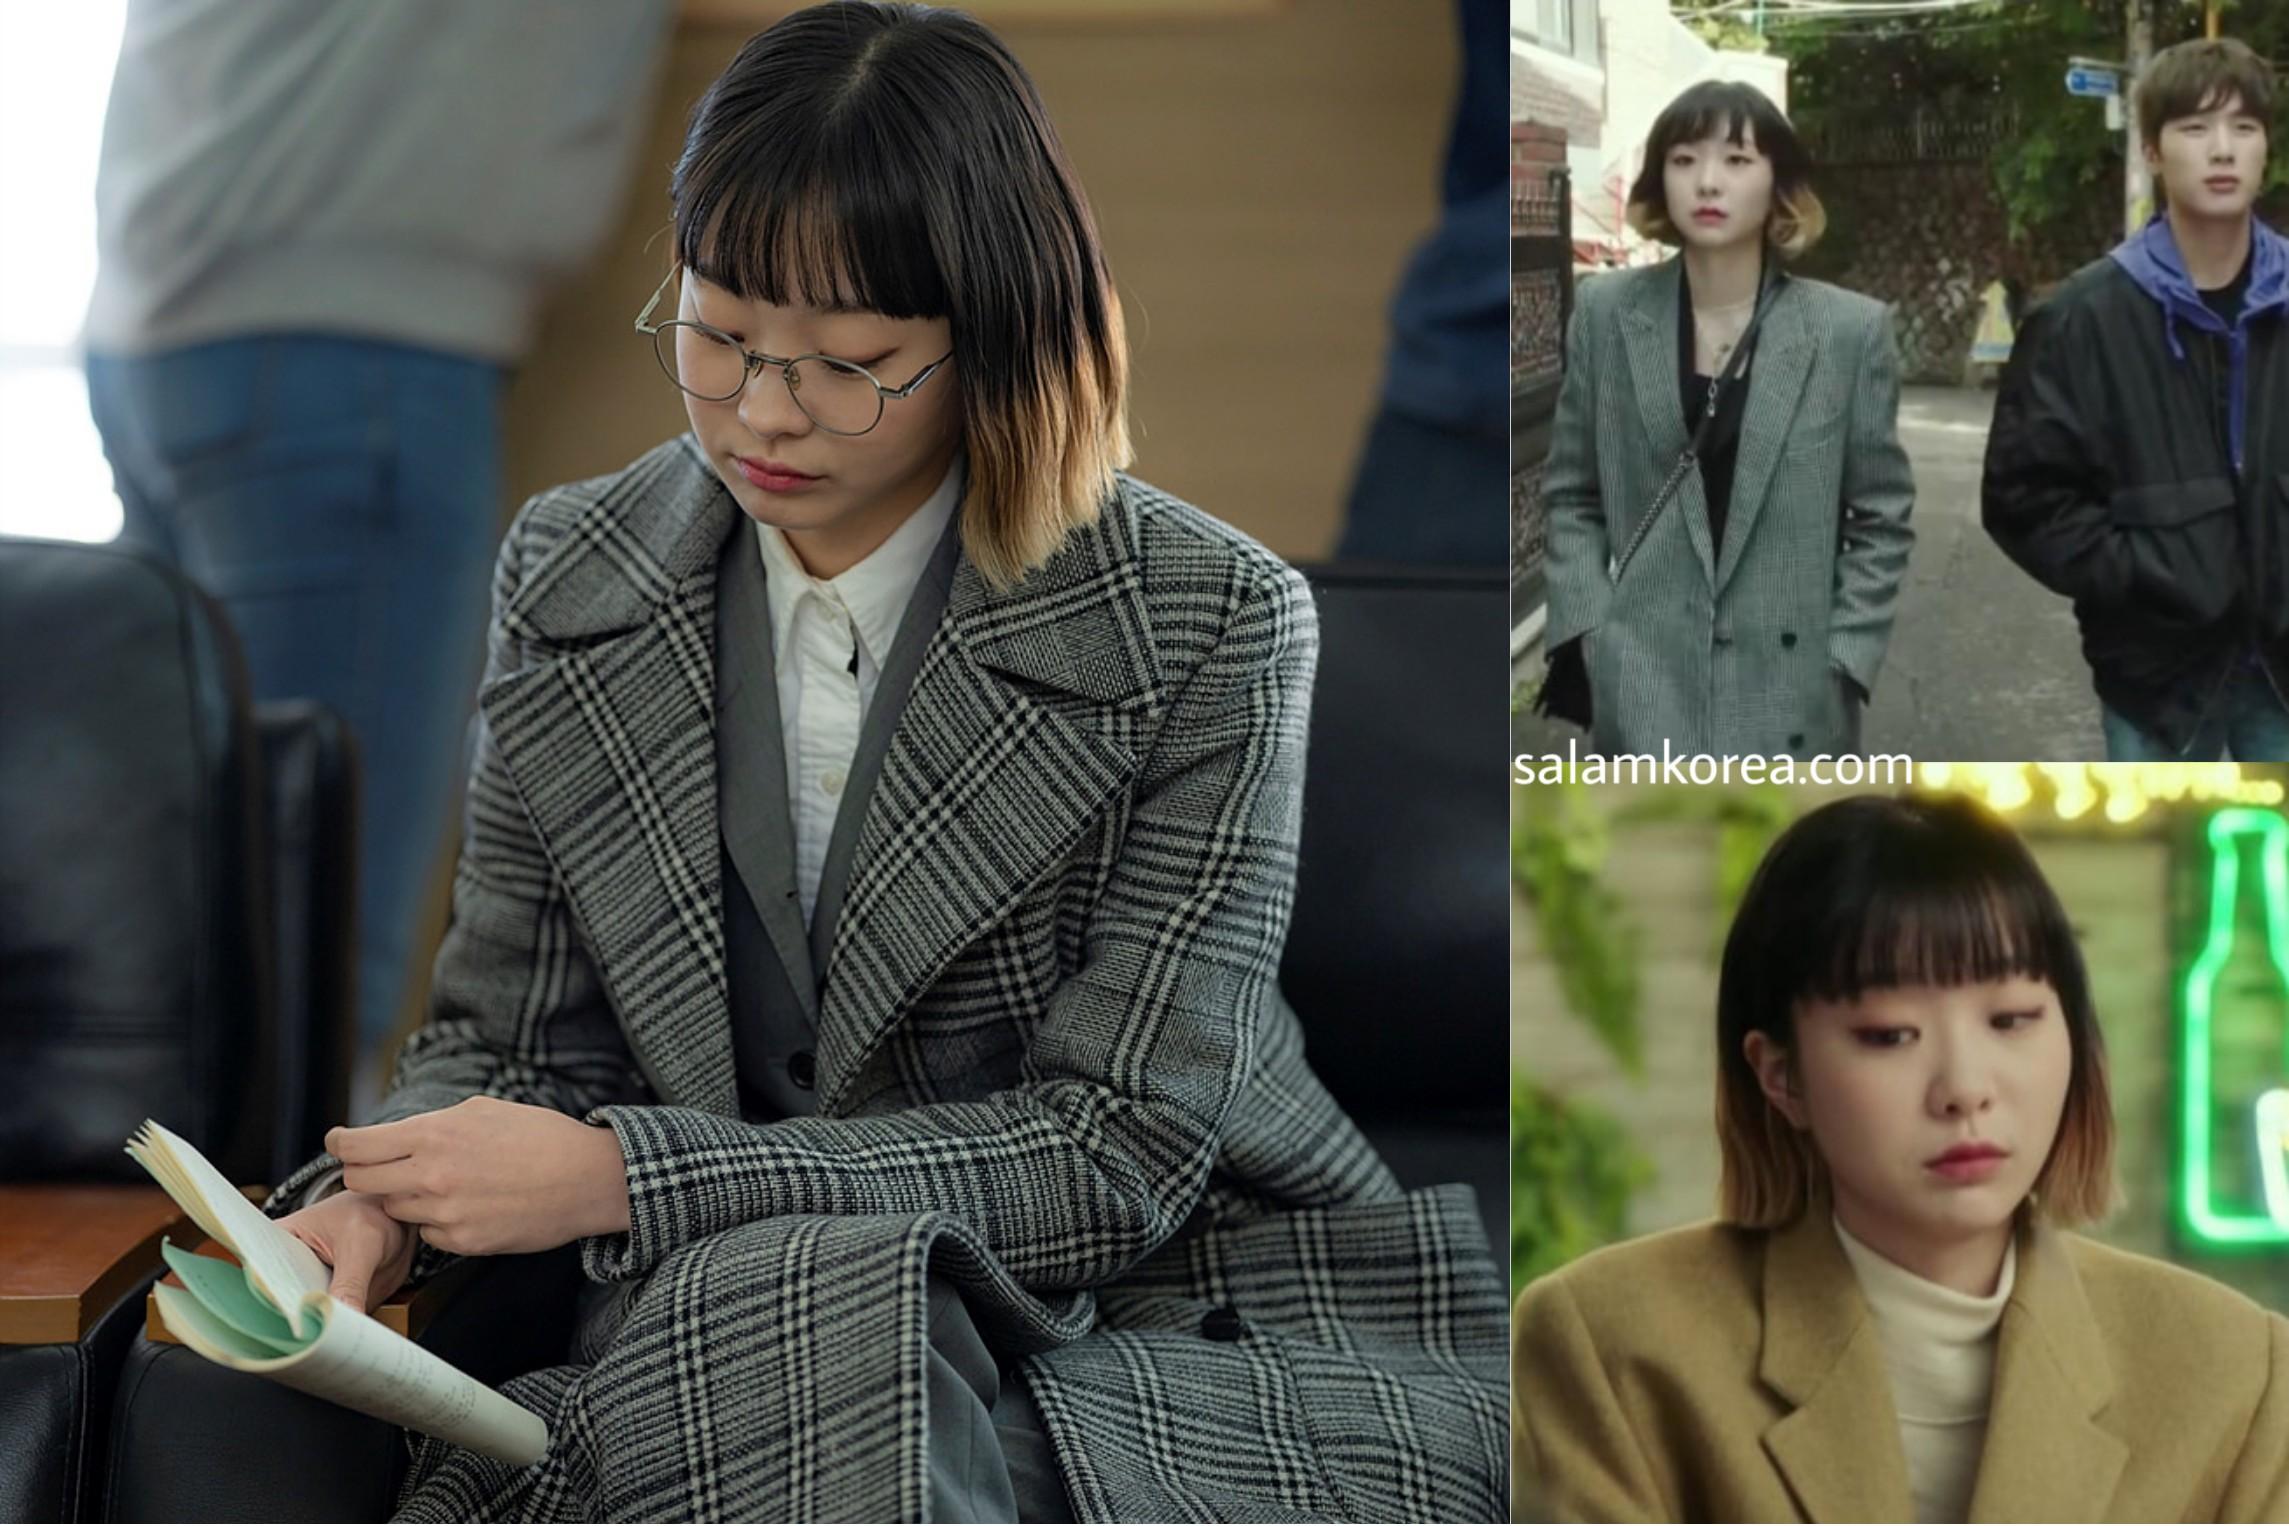 kim-da-mi-gaya-coat-jas-itaewon-class-salam-korea